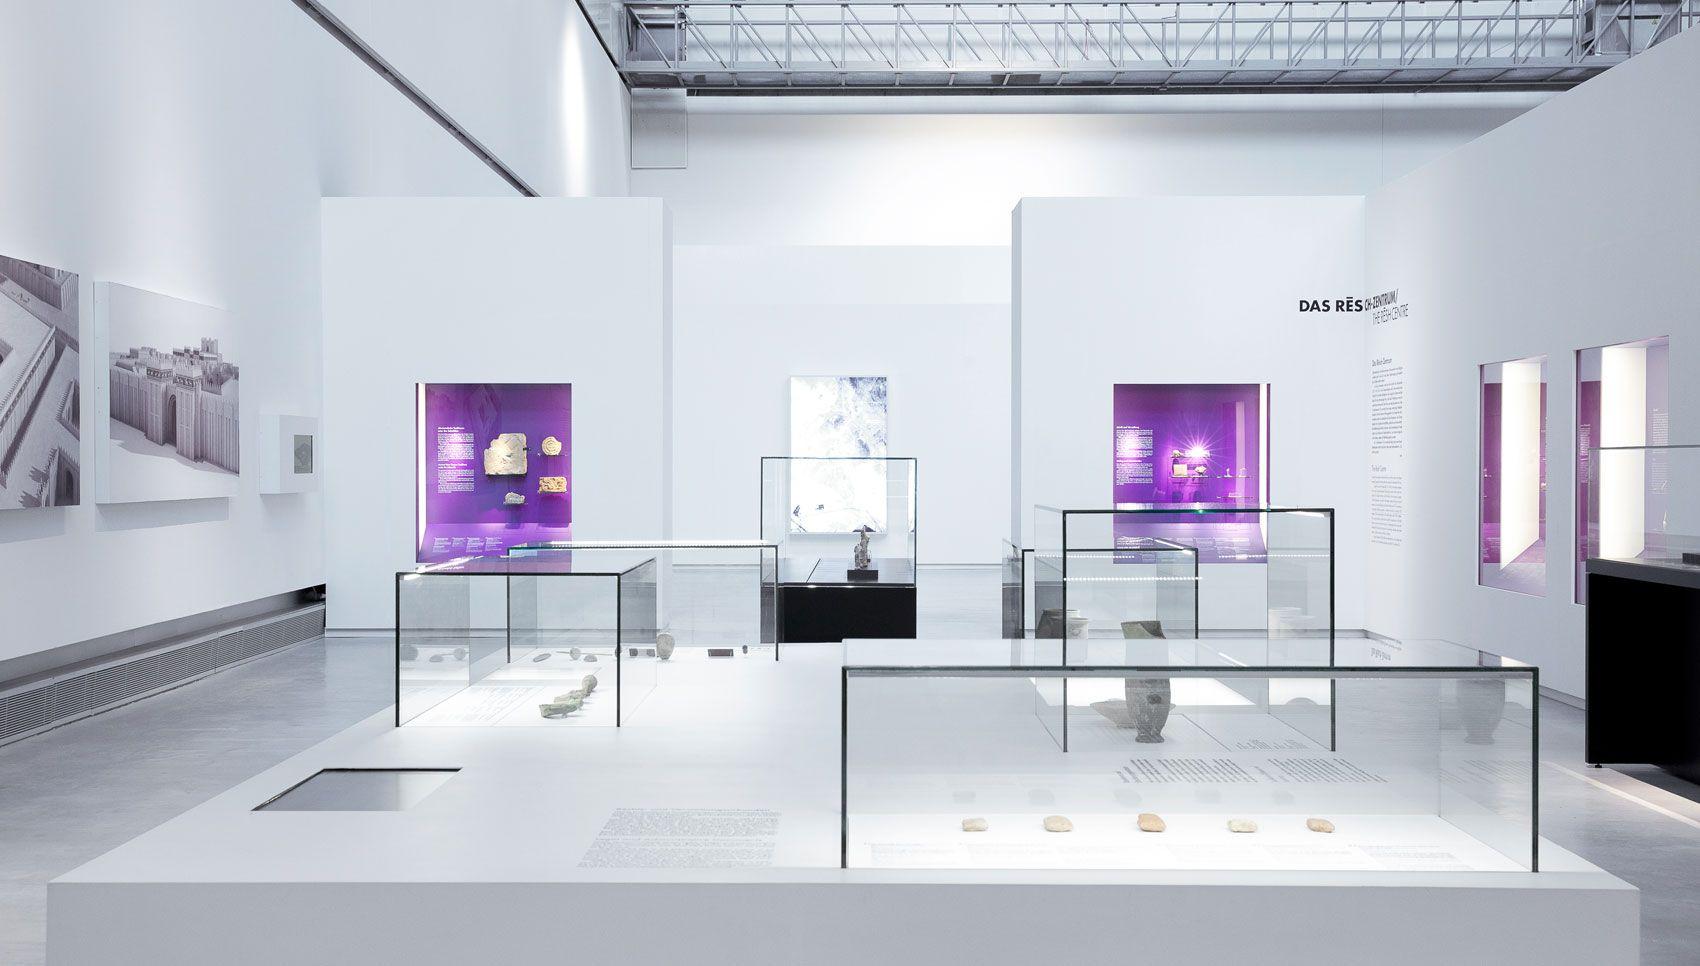 Uruk 5000 Jahre Megacity Pergamonmuseum Berlin Architektur Ausstellung